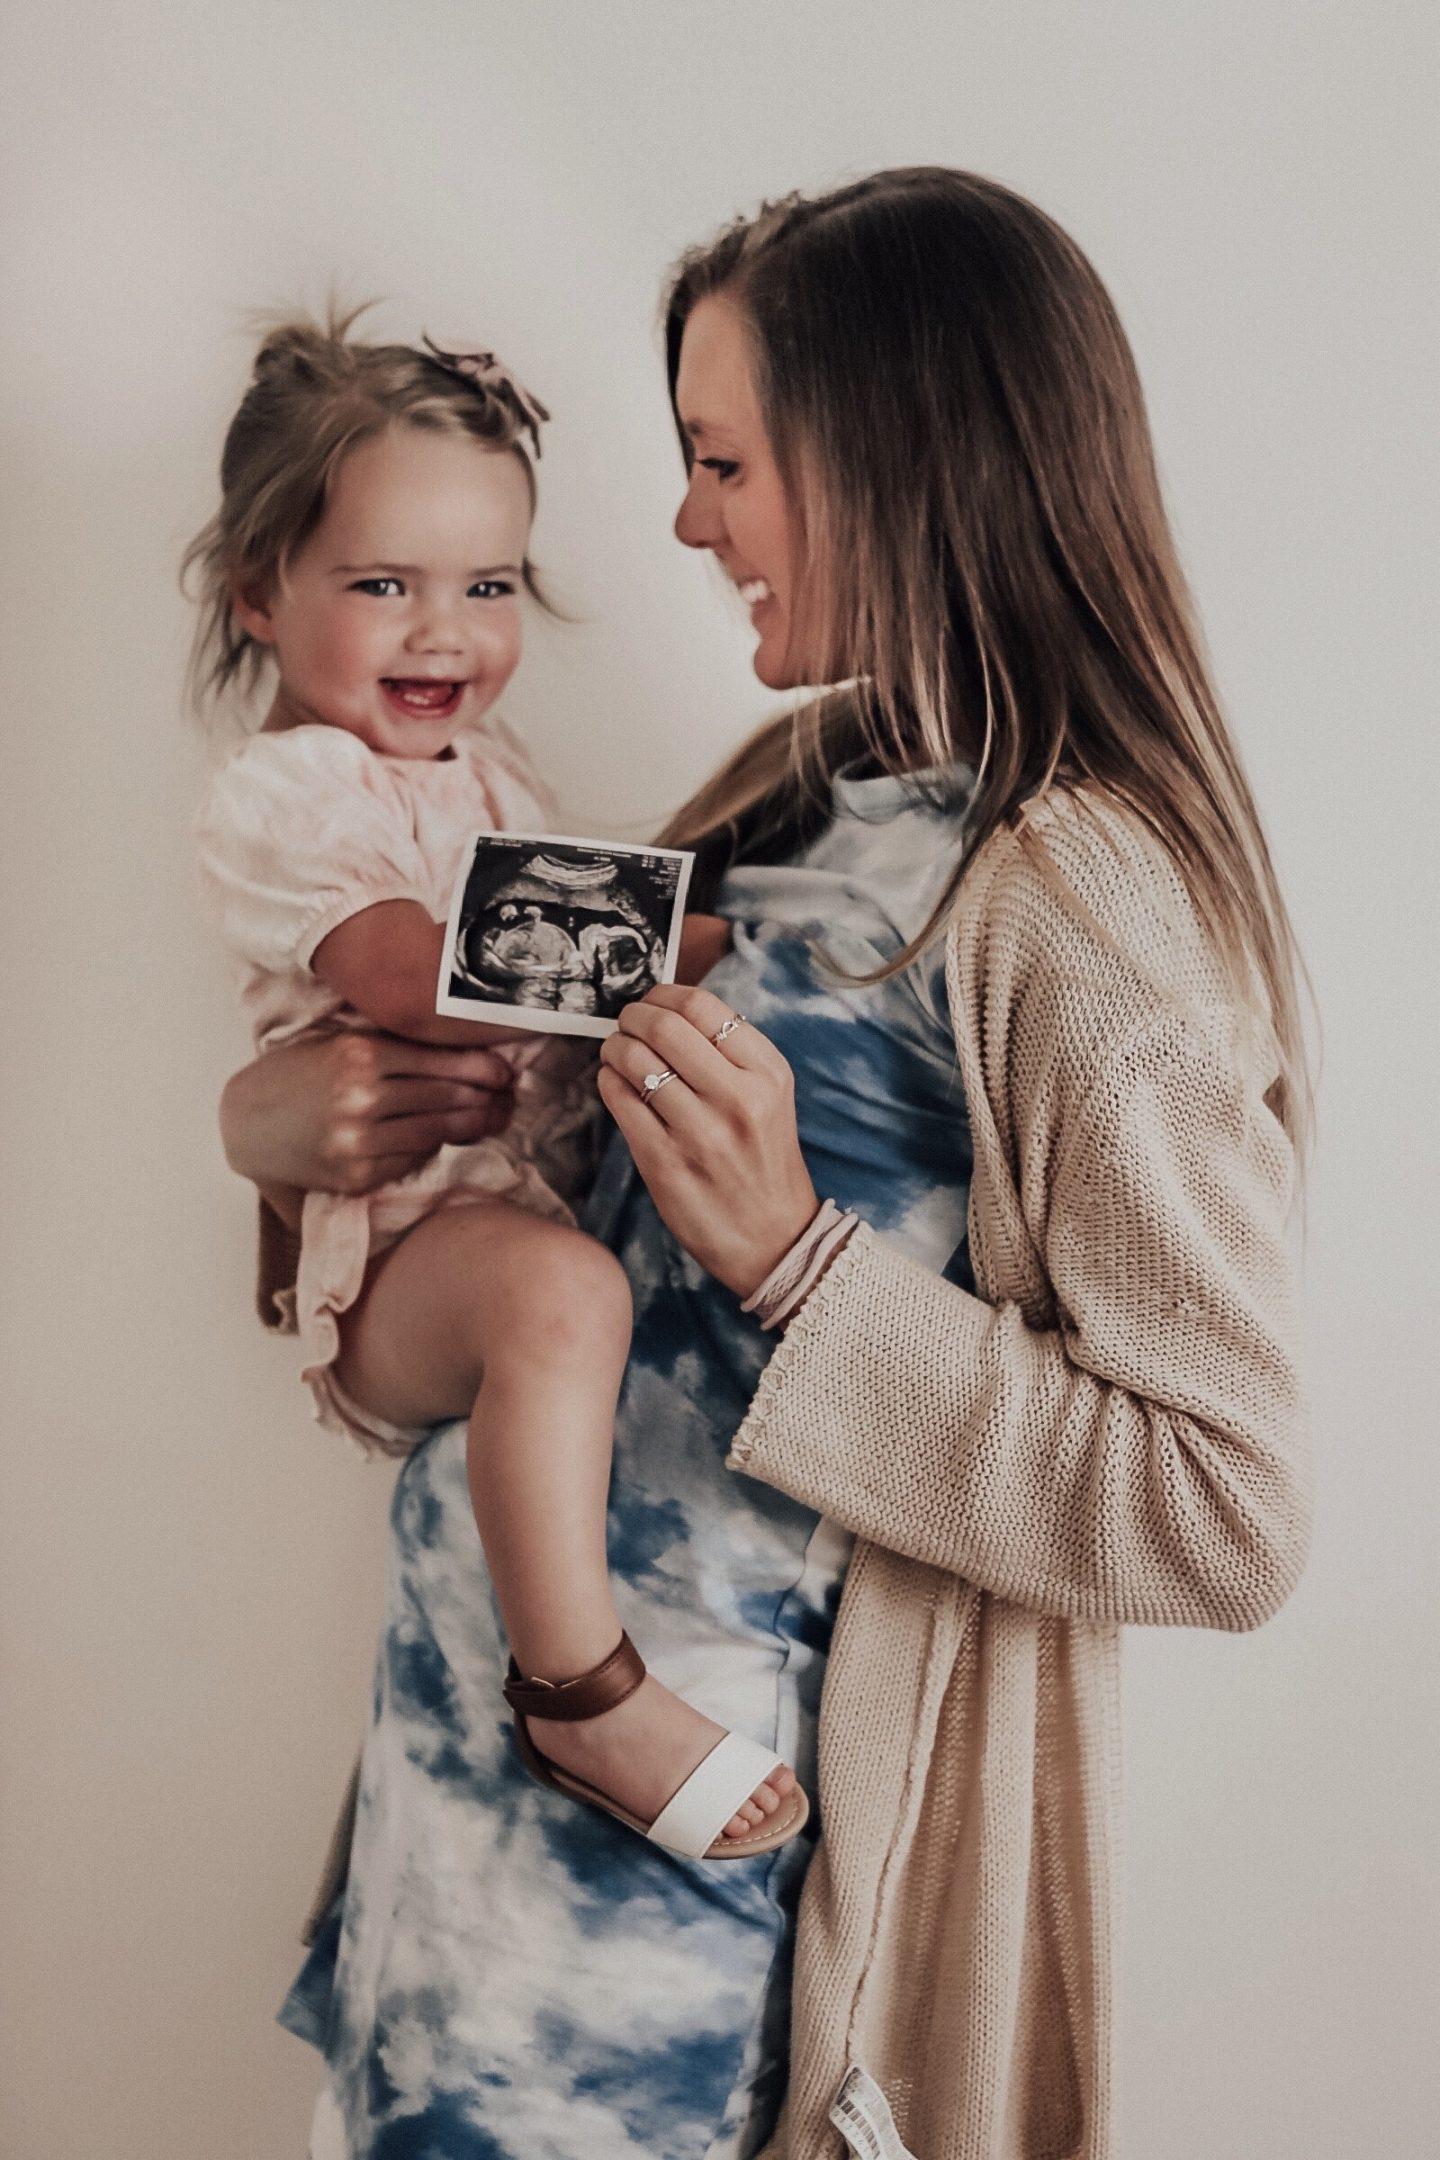 prenatal visits during COVID-19